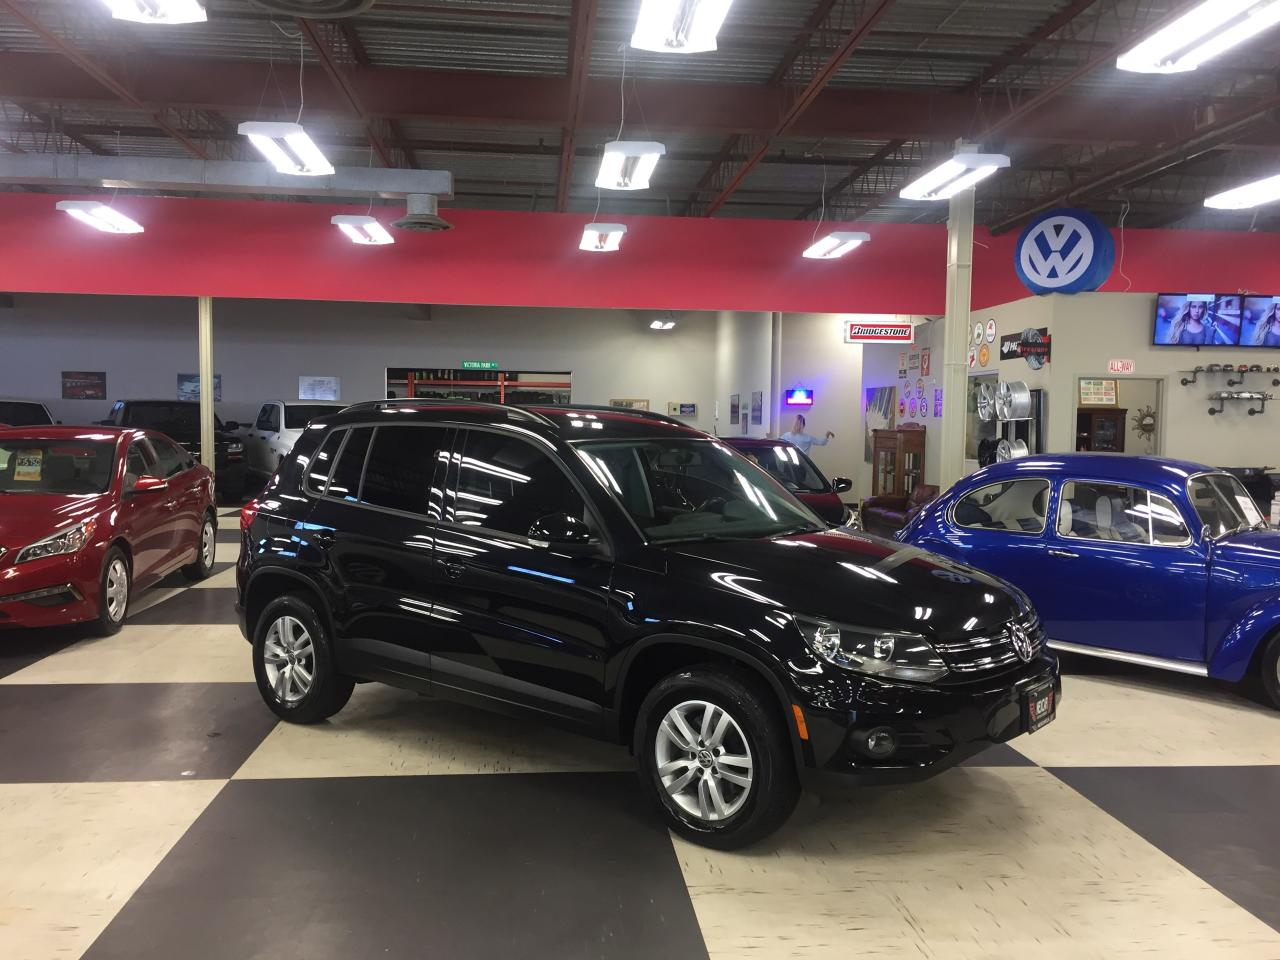 2015 Volkswagen Tiguan 2.0TSI 6SPEED A/C CRUISE REAR CAMERA H/SEATS 103K